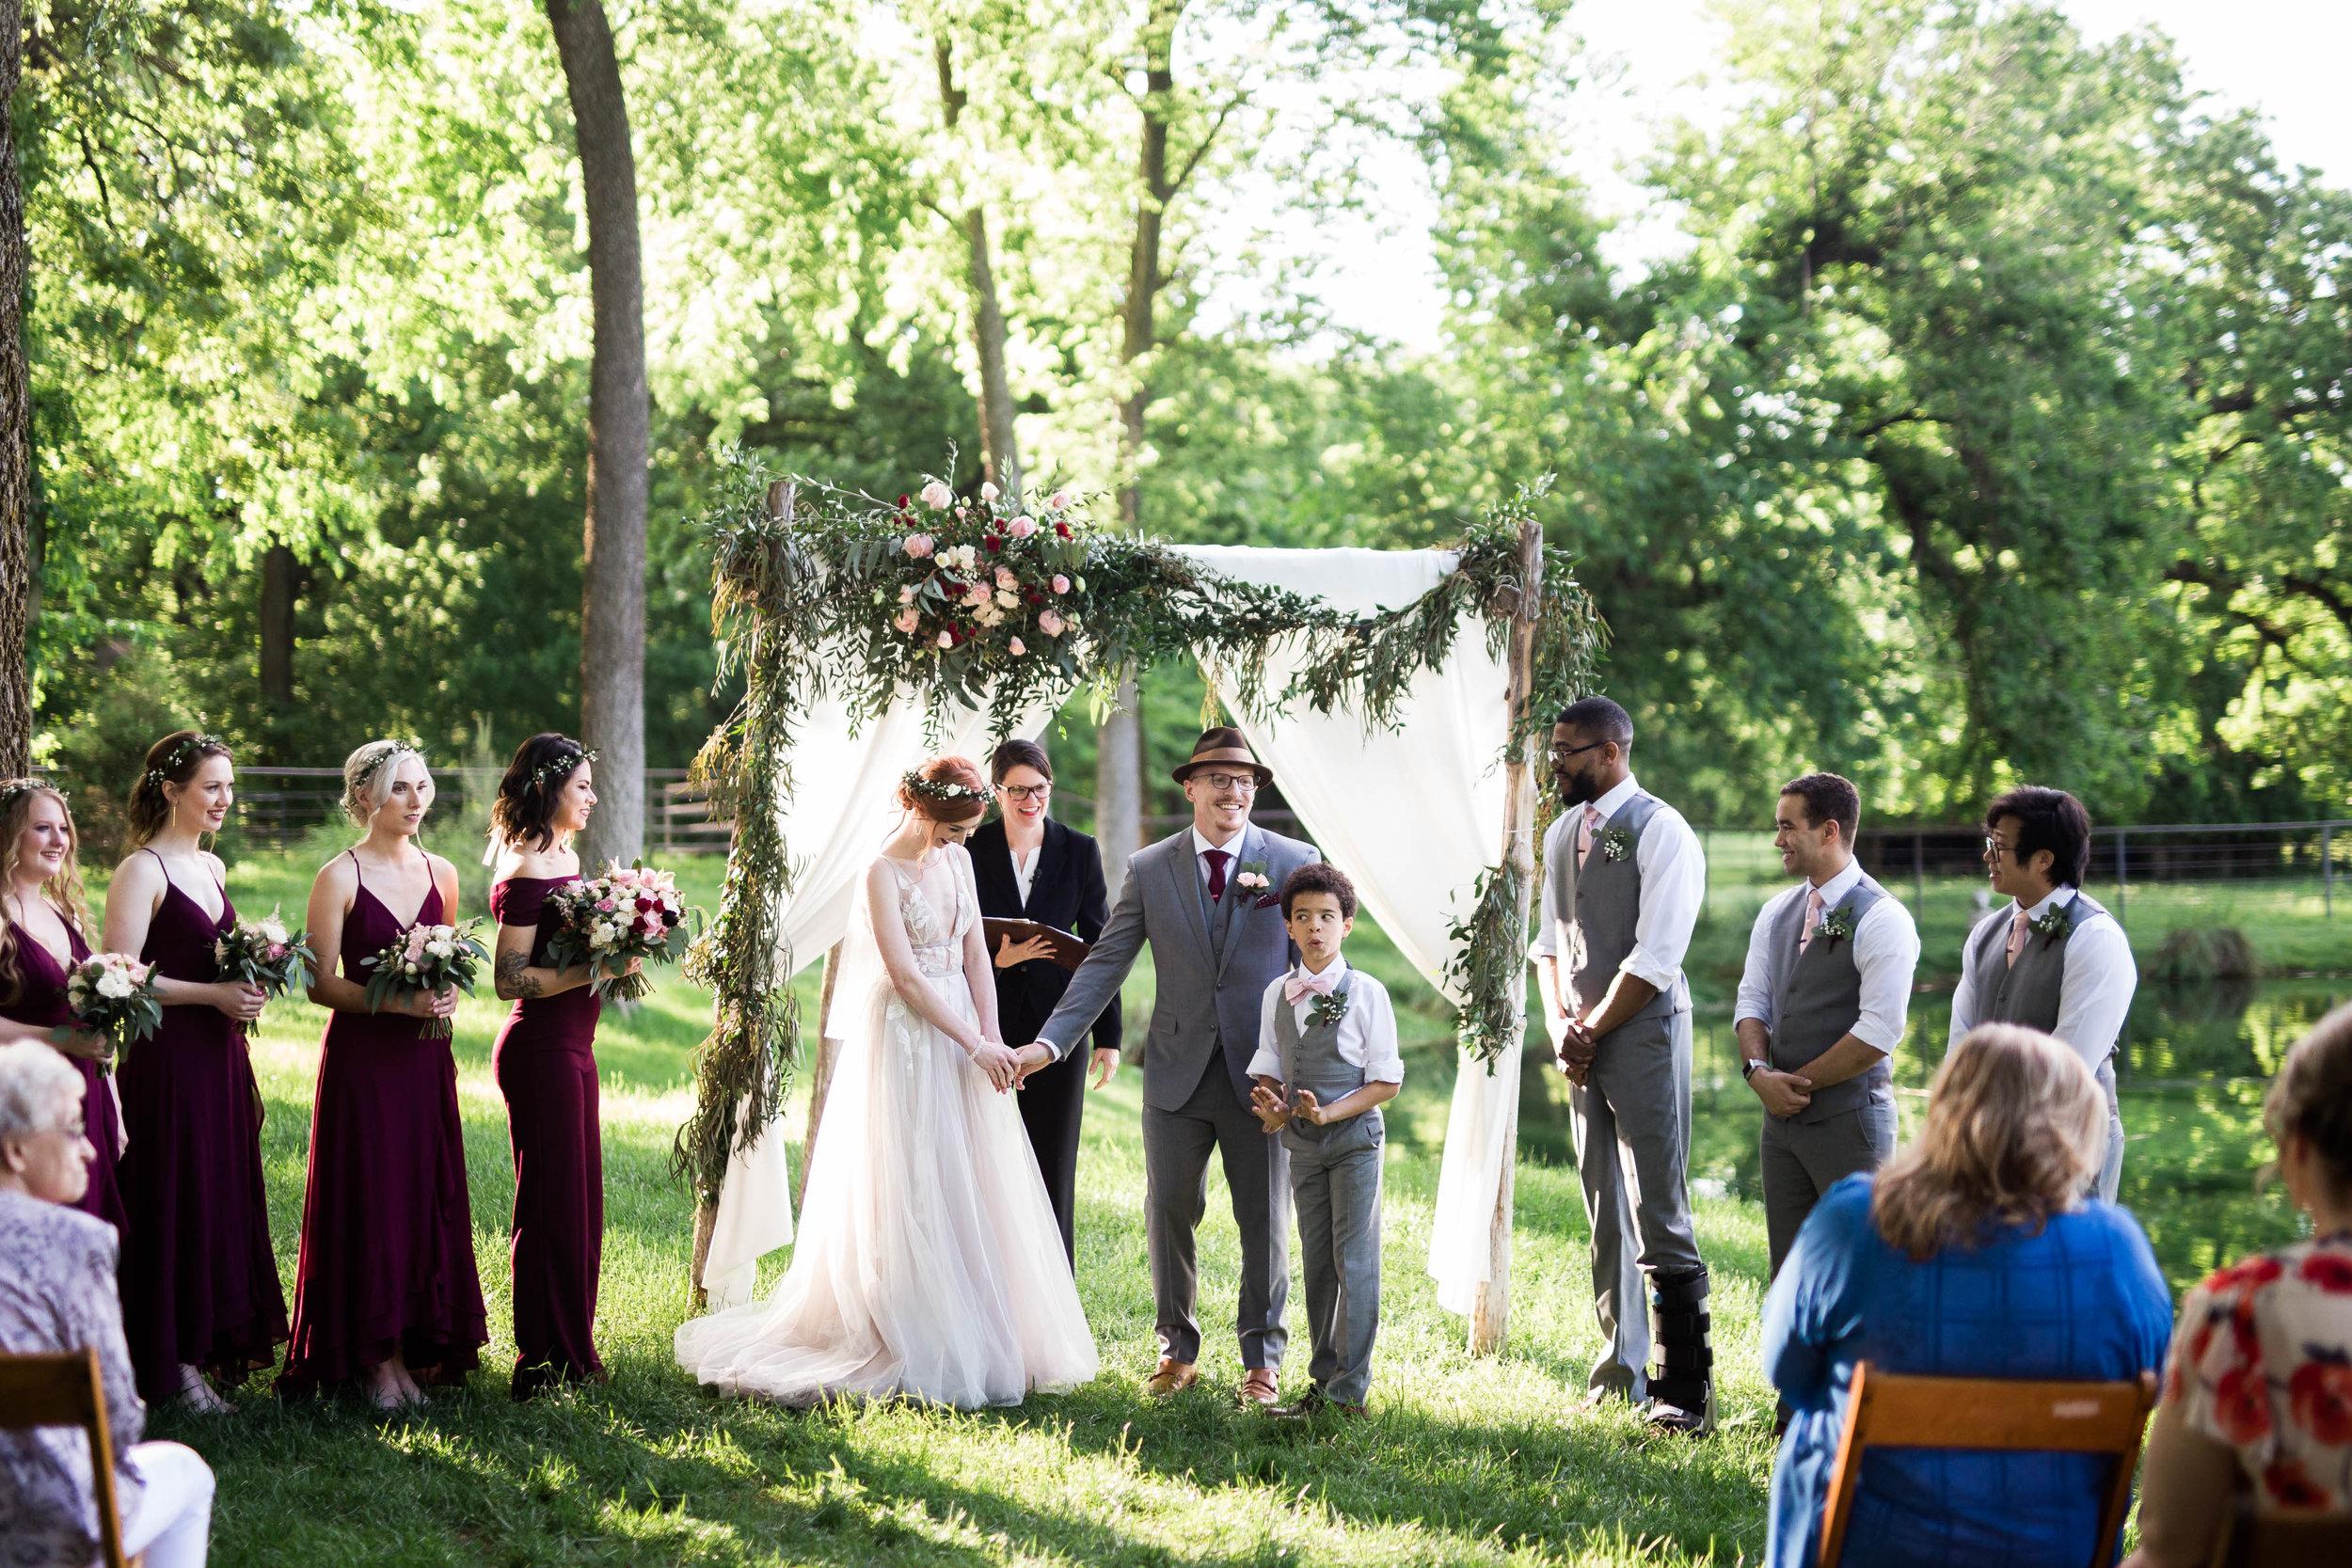 armstrong-wedding-503.jpg